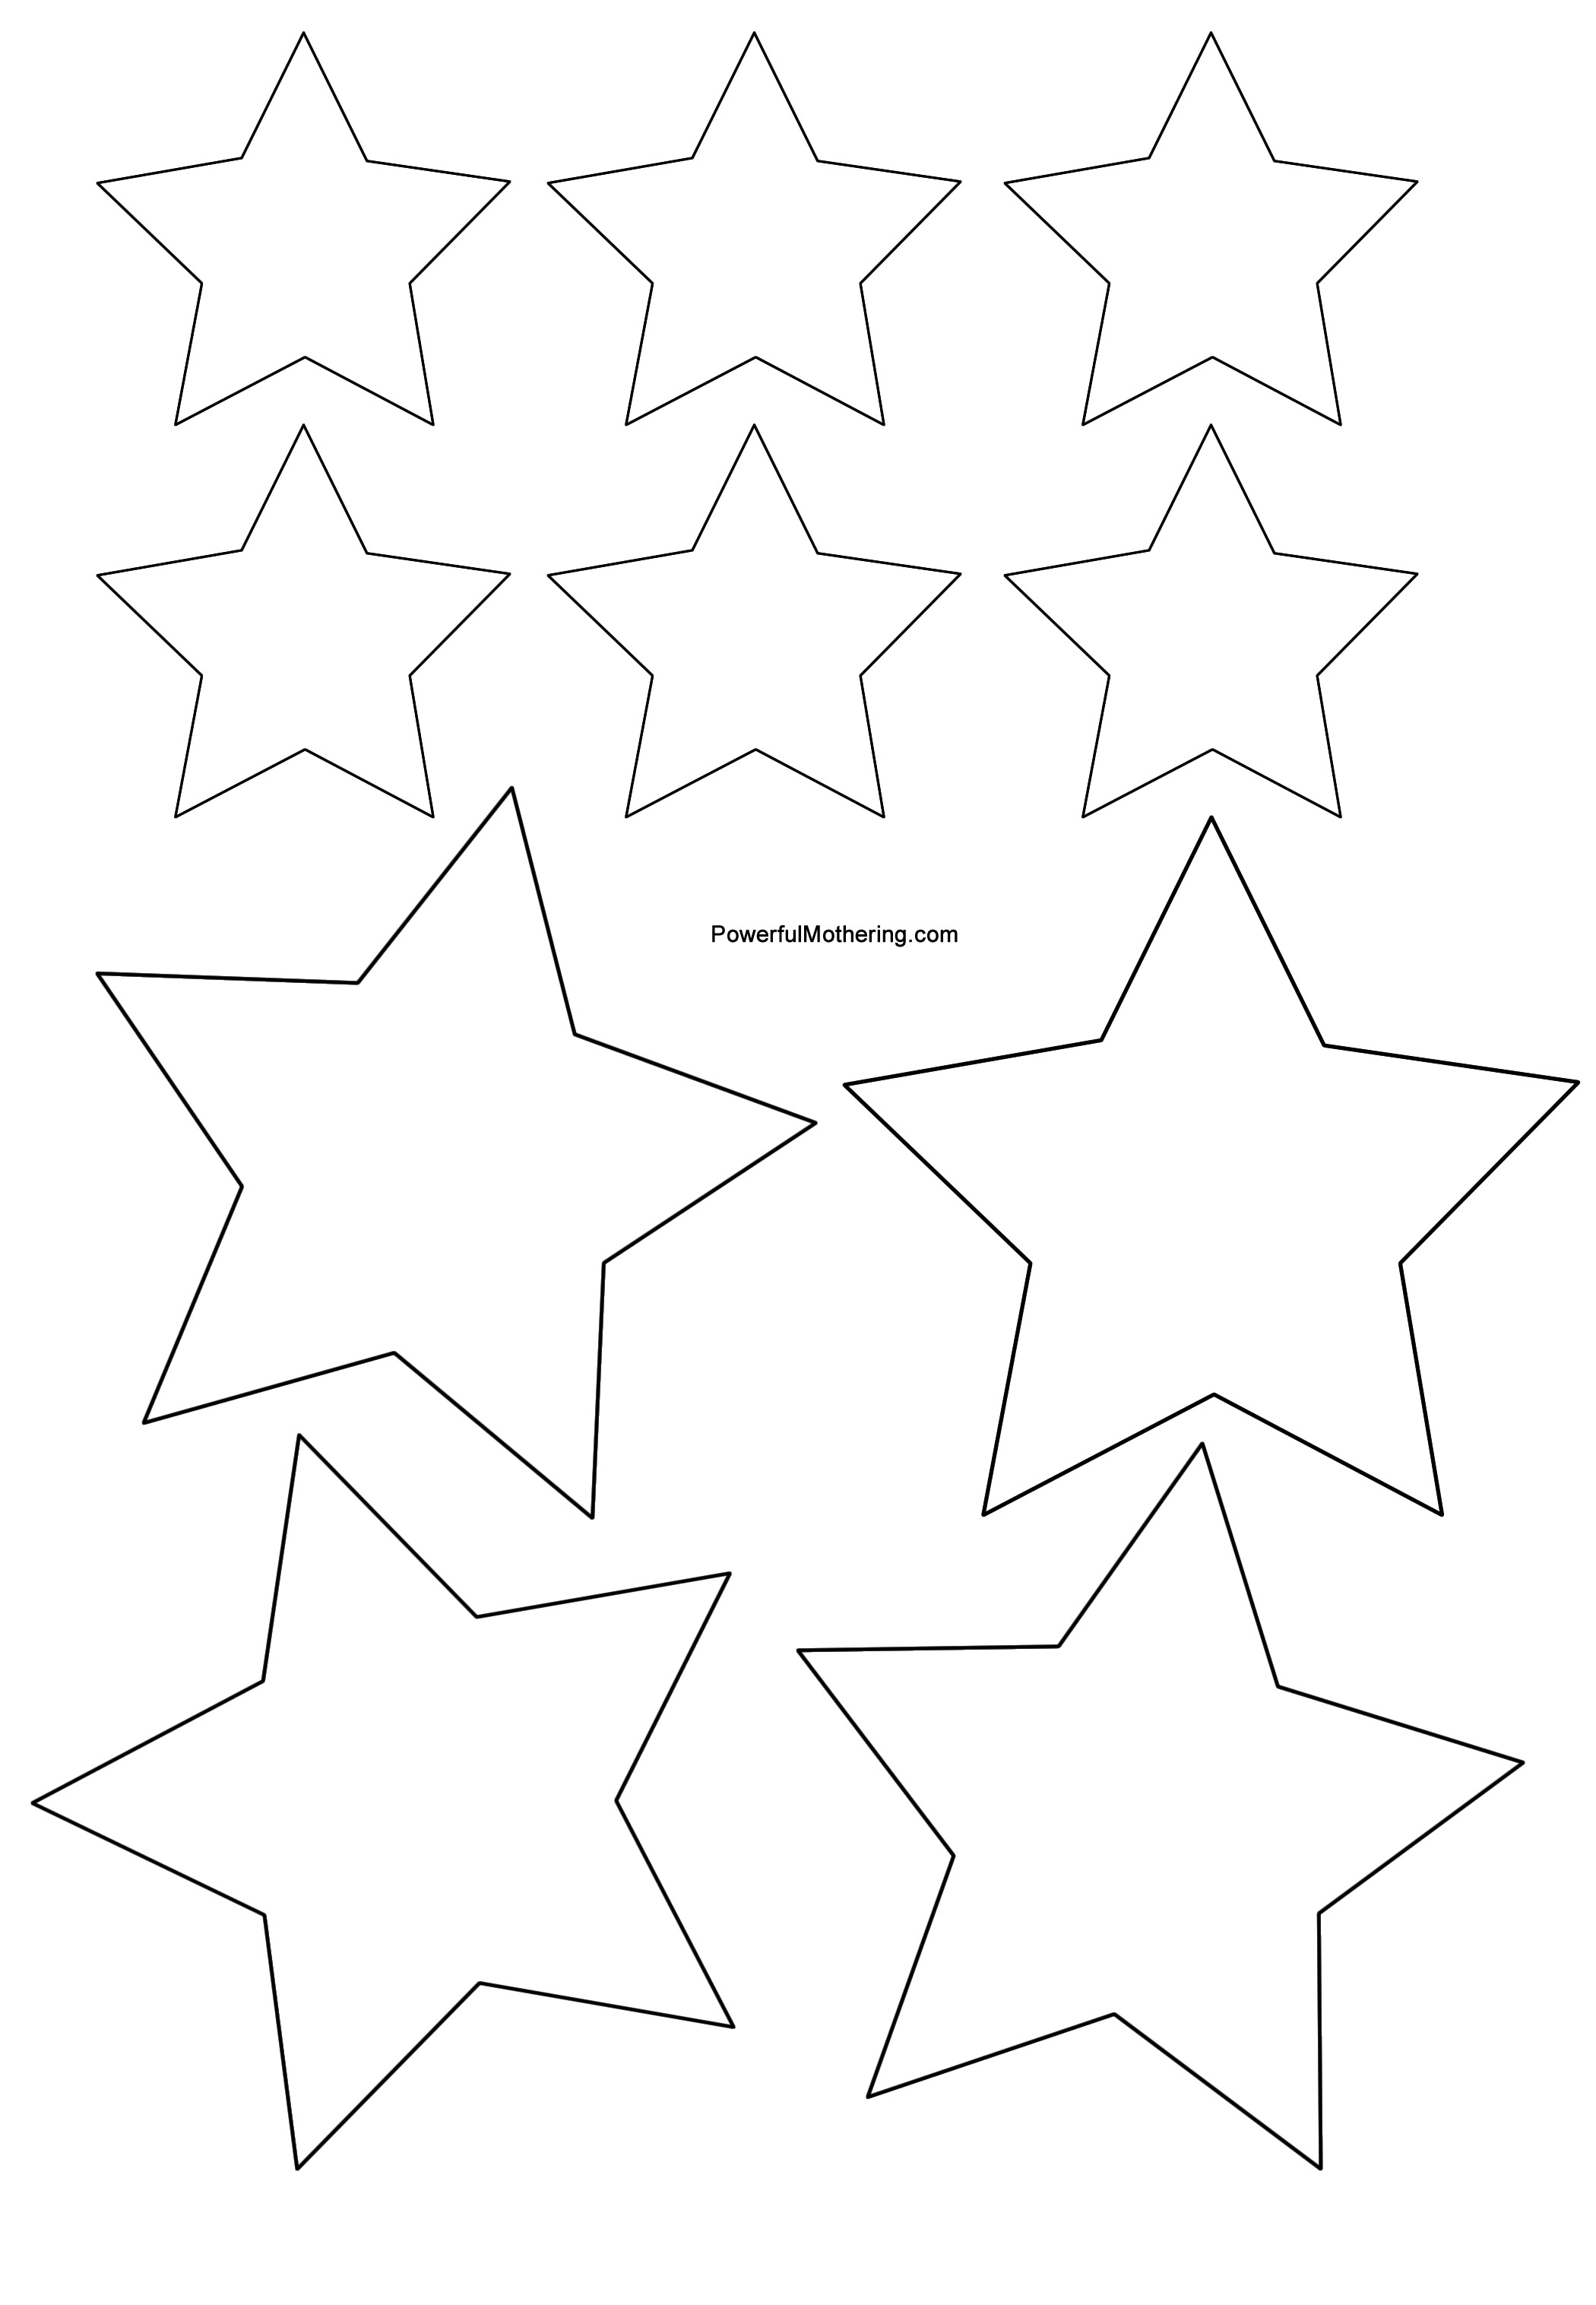 Free Printable Star, Download Free Clip Art, Free Clip Art On - Free Printable Cookie Stencils